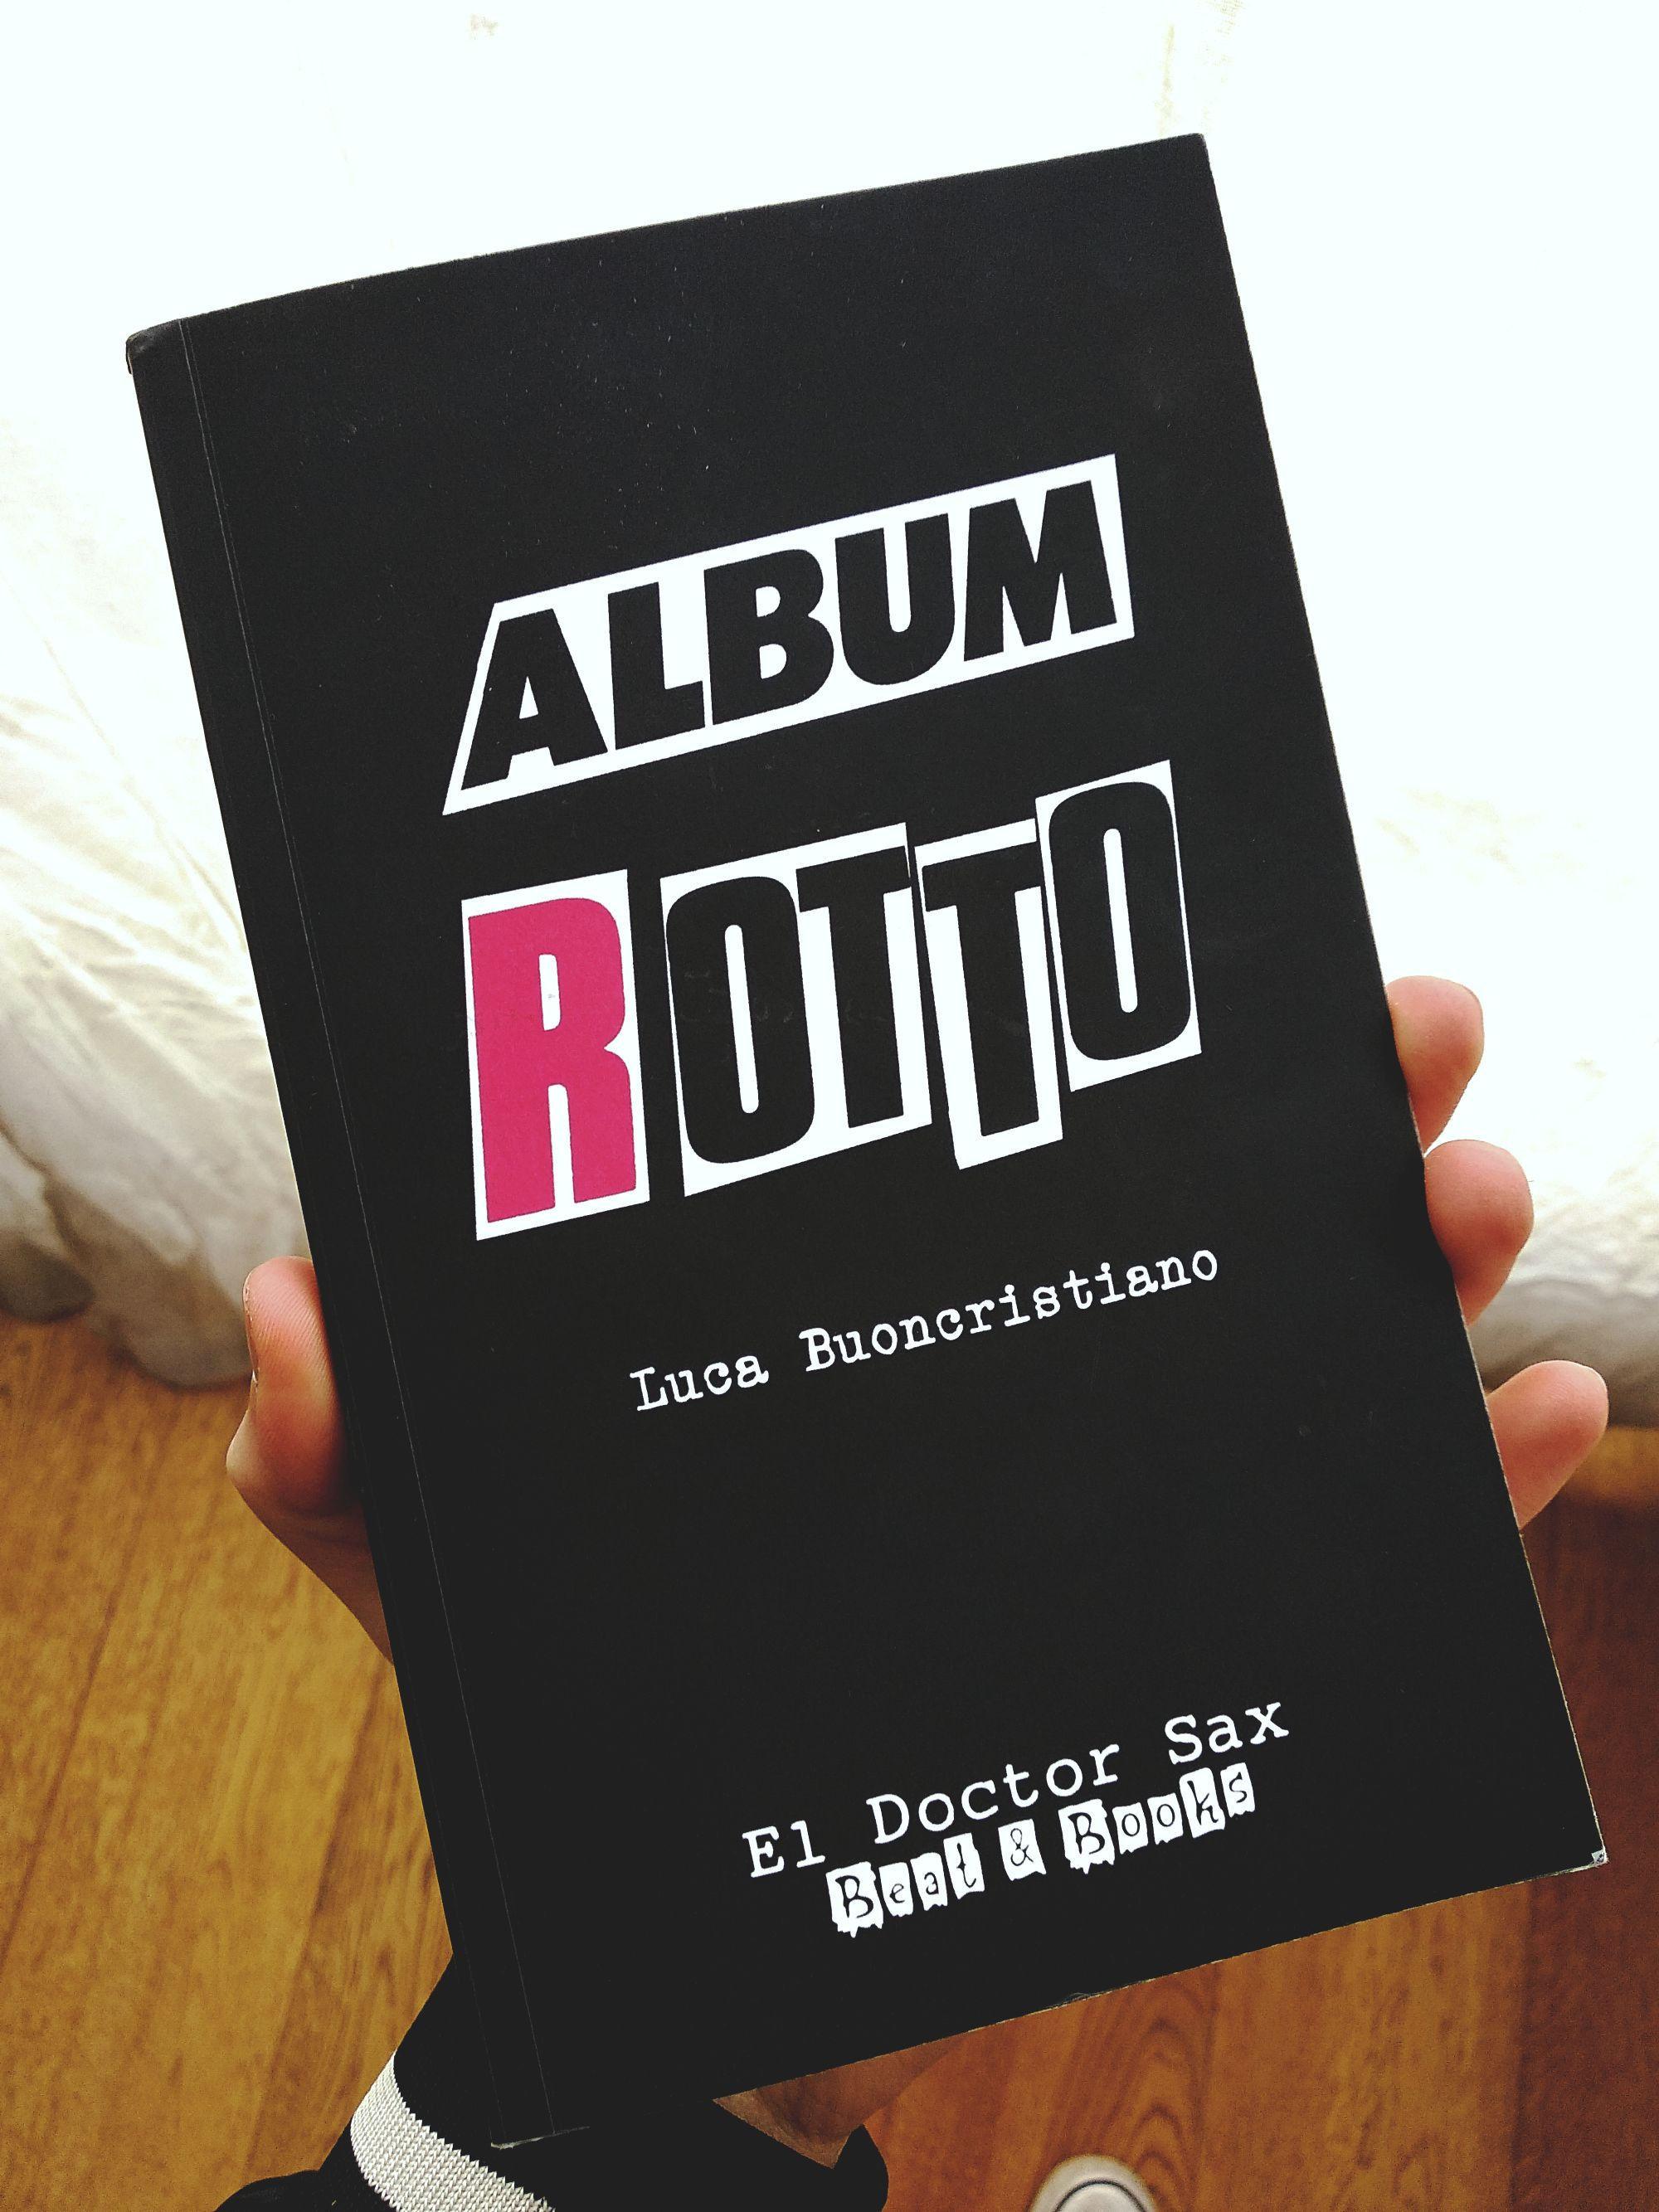 Album Rotto - text